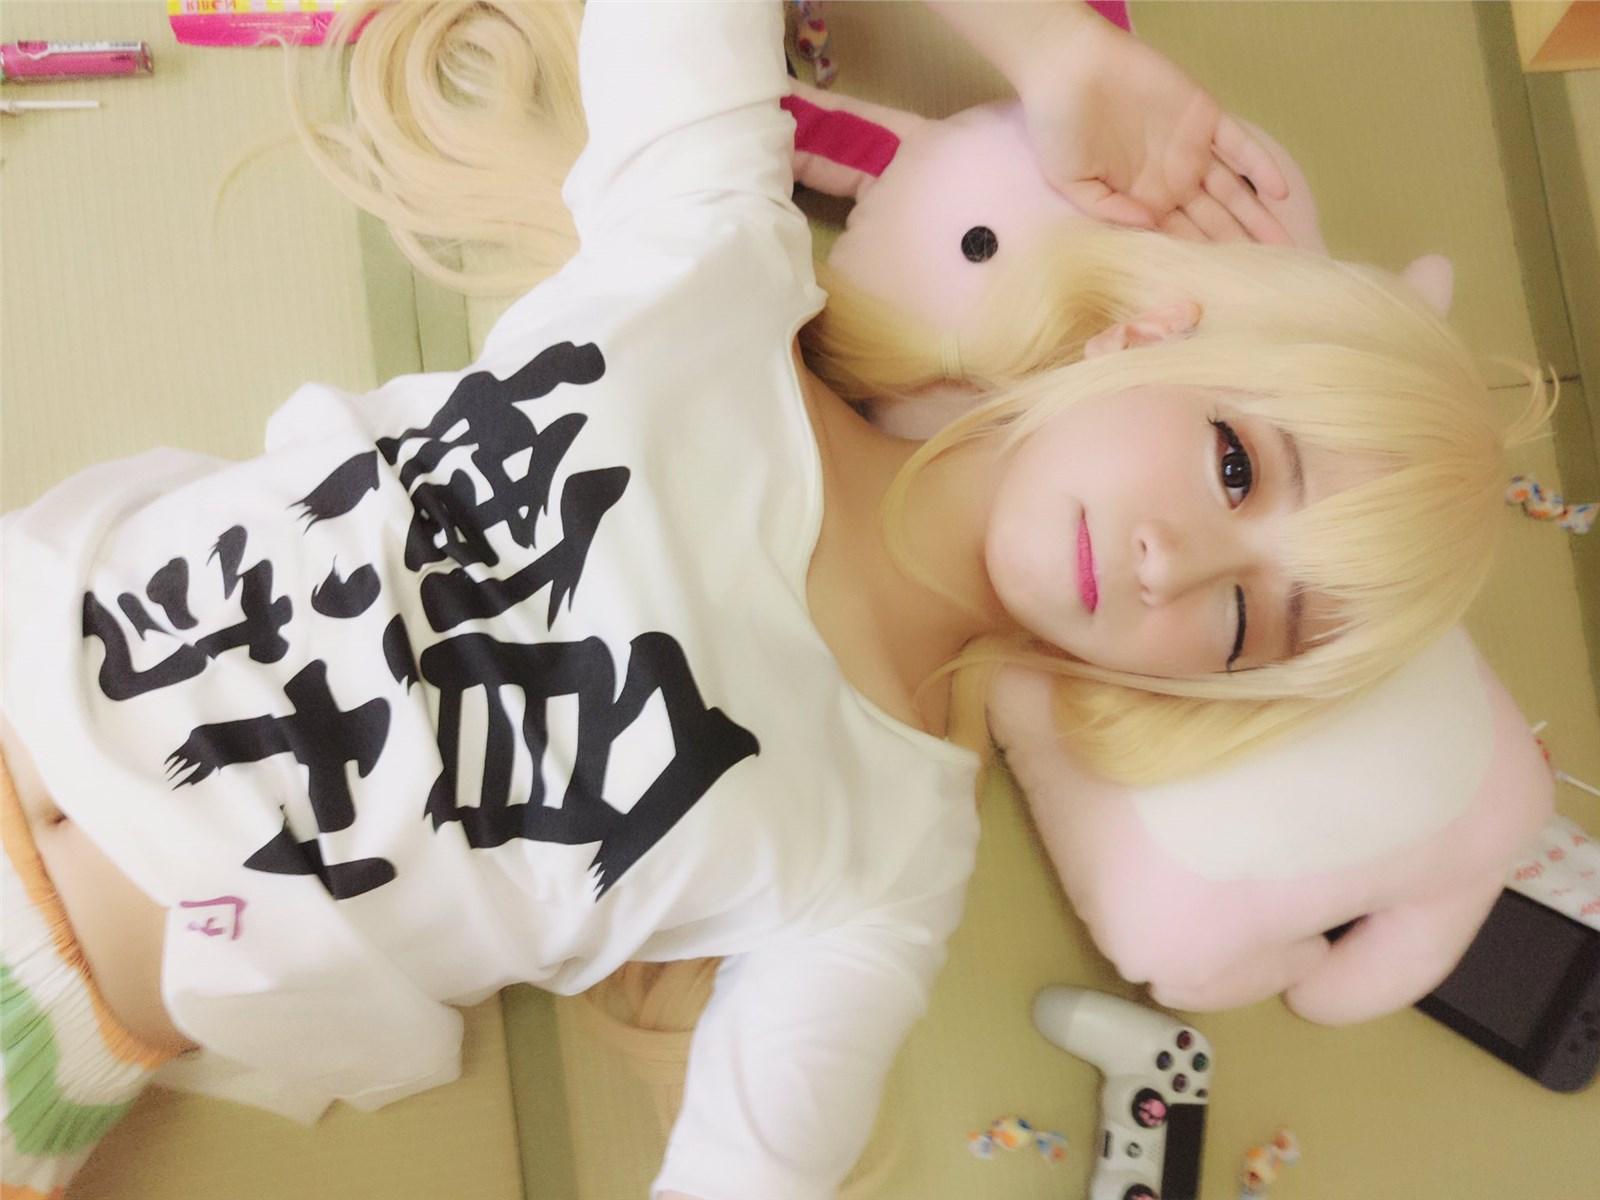 童颜巨乳COSER小姐姐yami推特图集 Yami-twitter7(7)